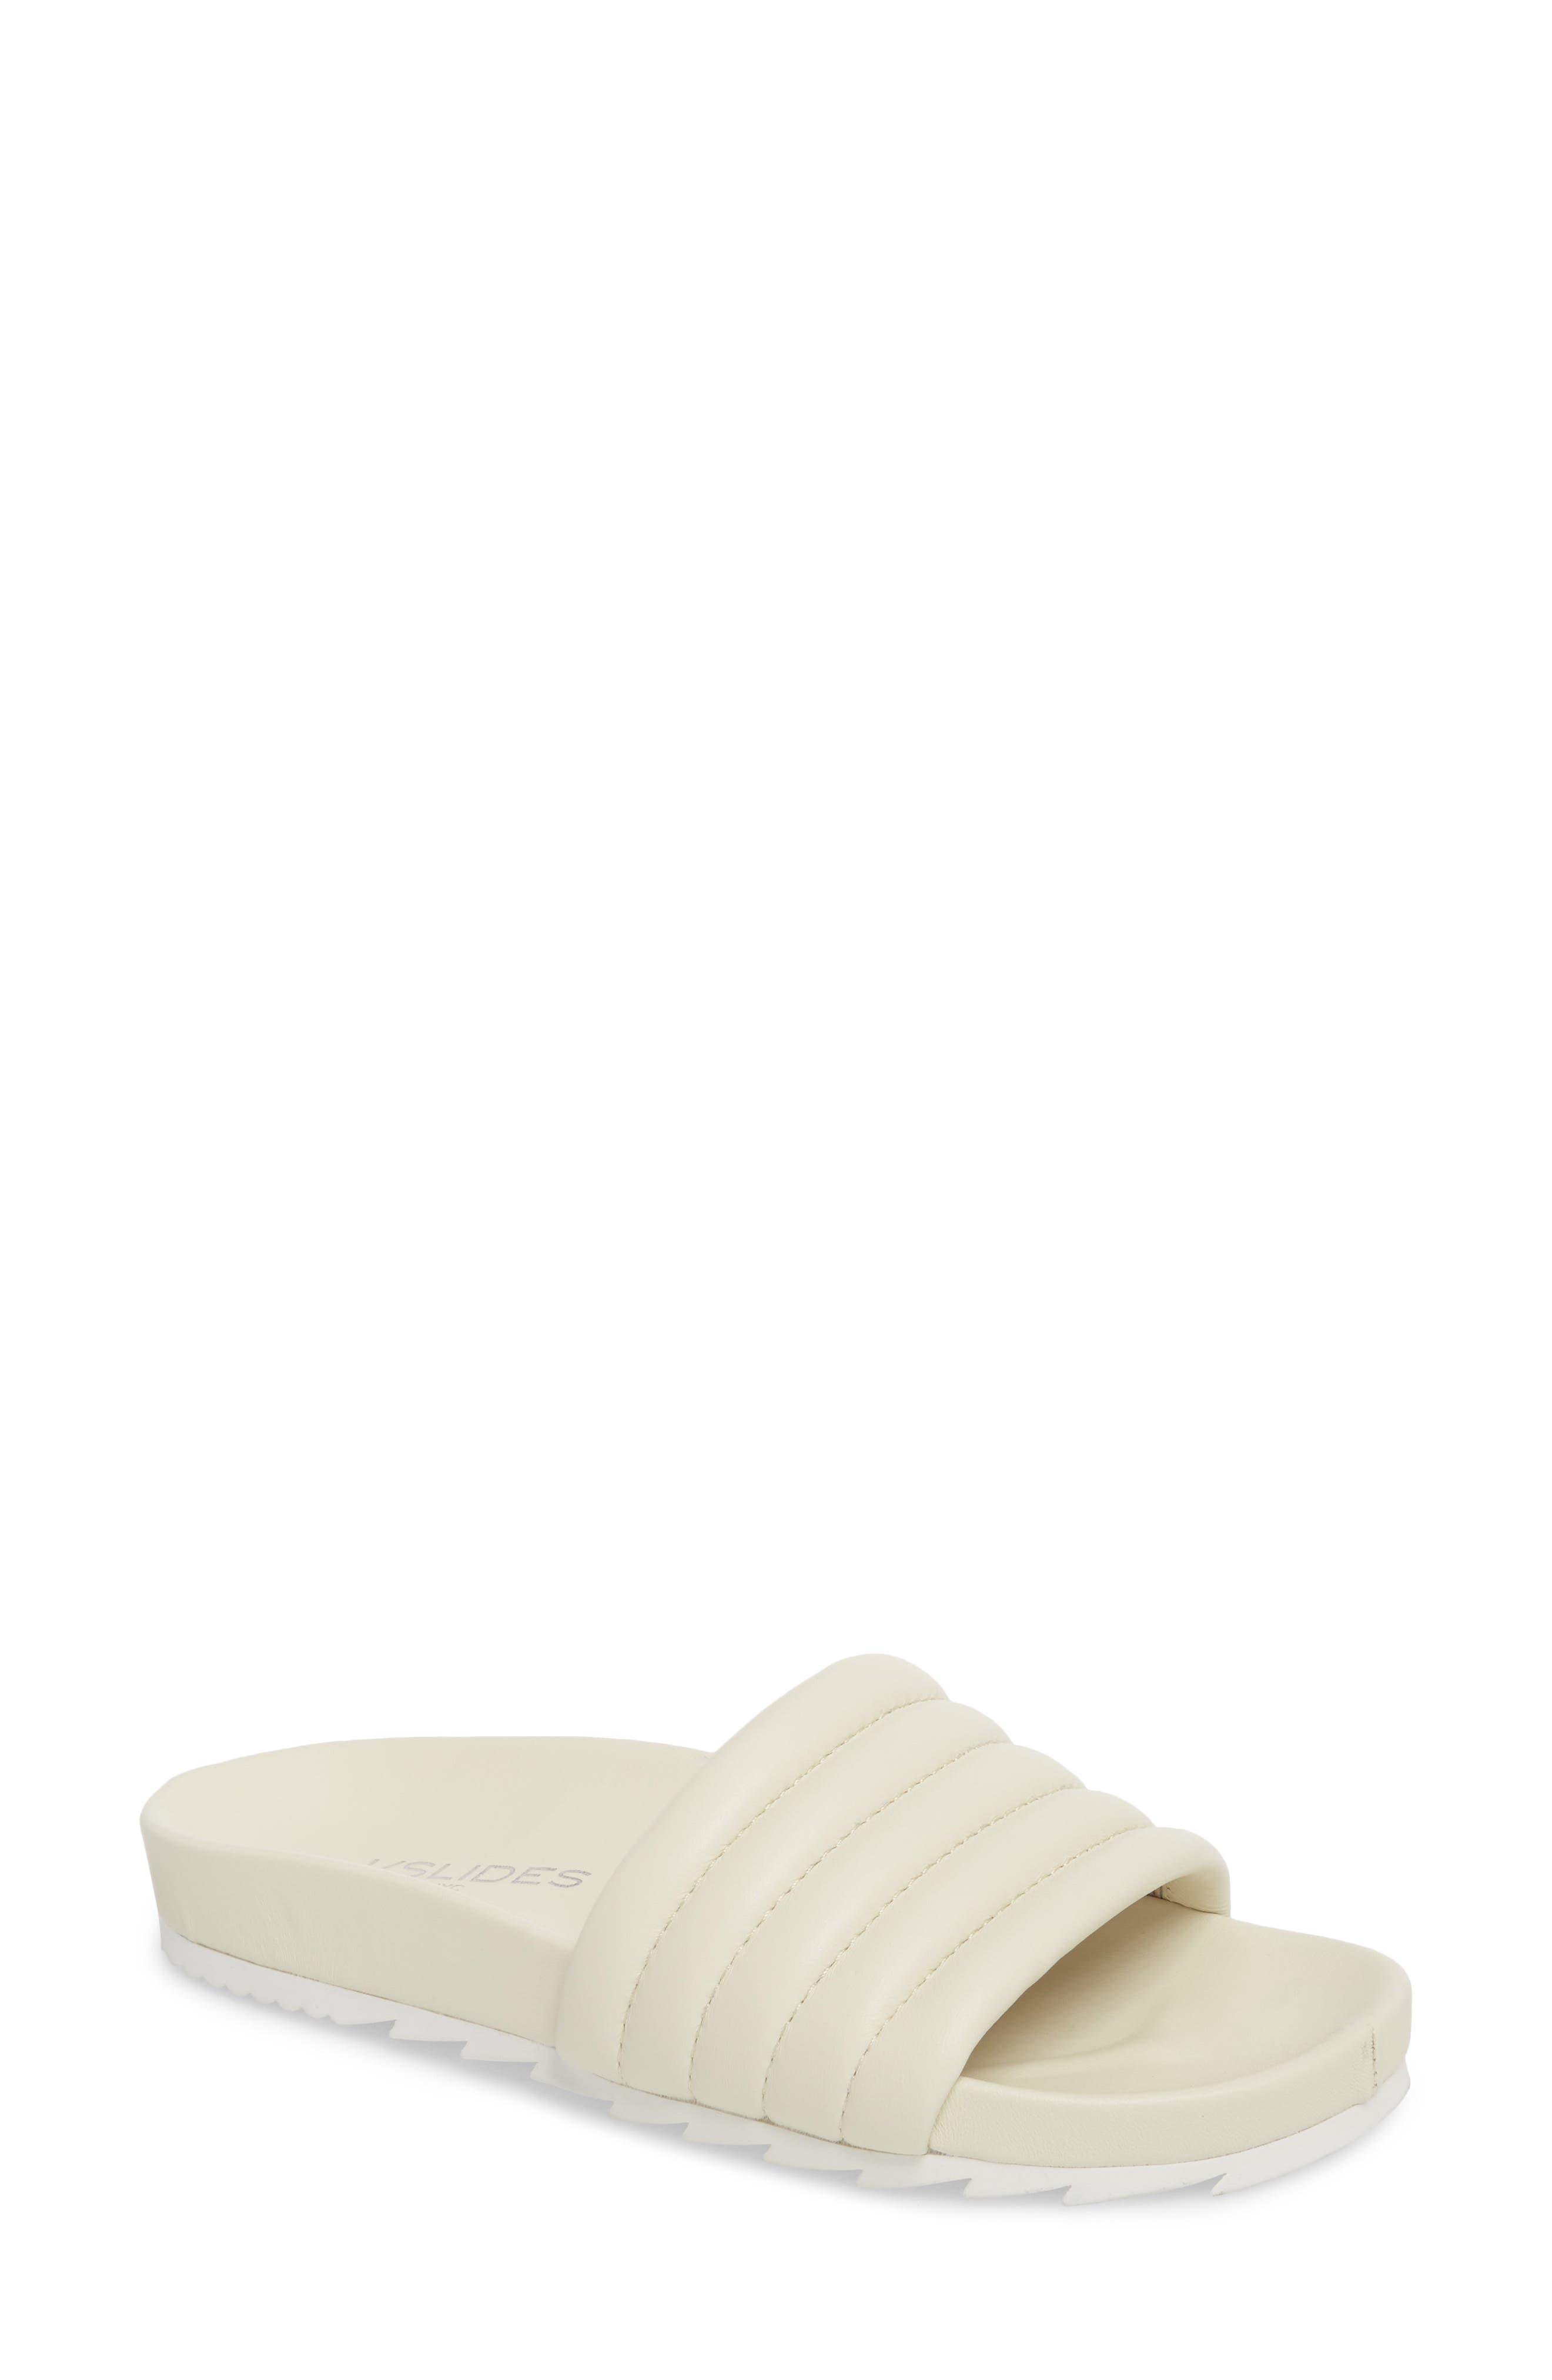 Eppie Slide Sandal,                             Main thumbnail 1, color,                             OFF WHITE LEATHER